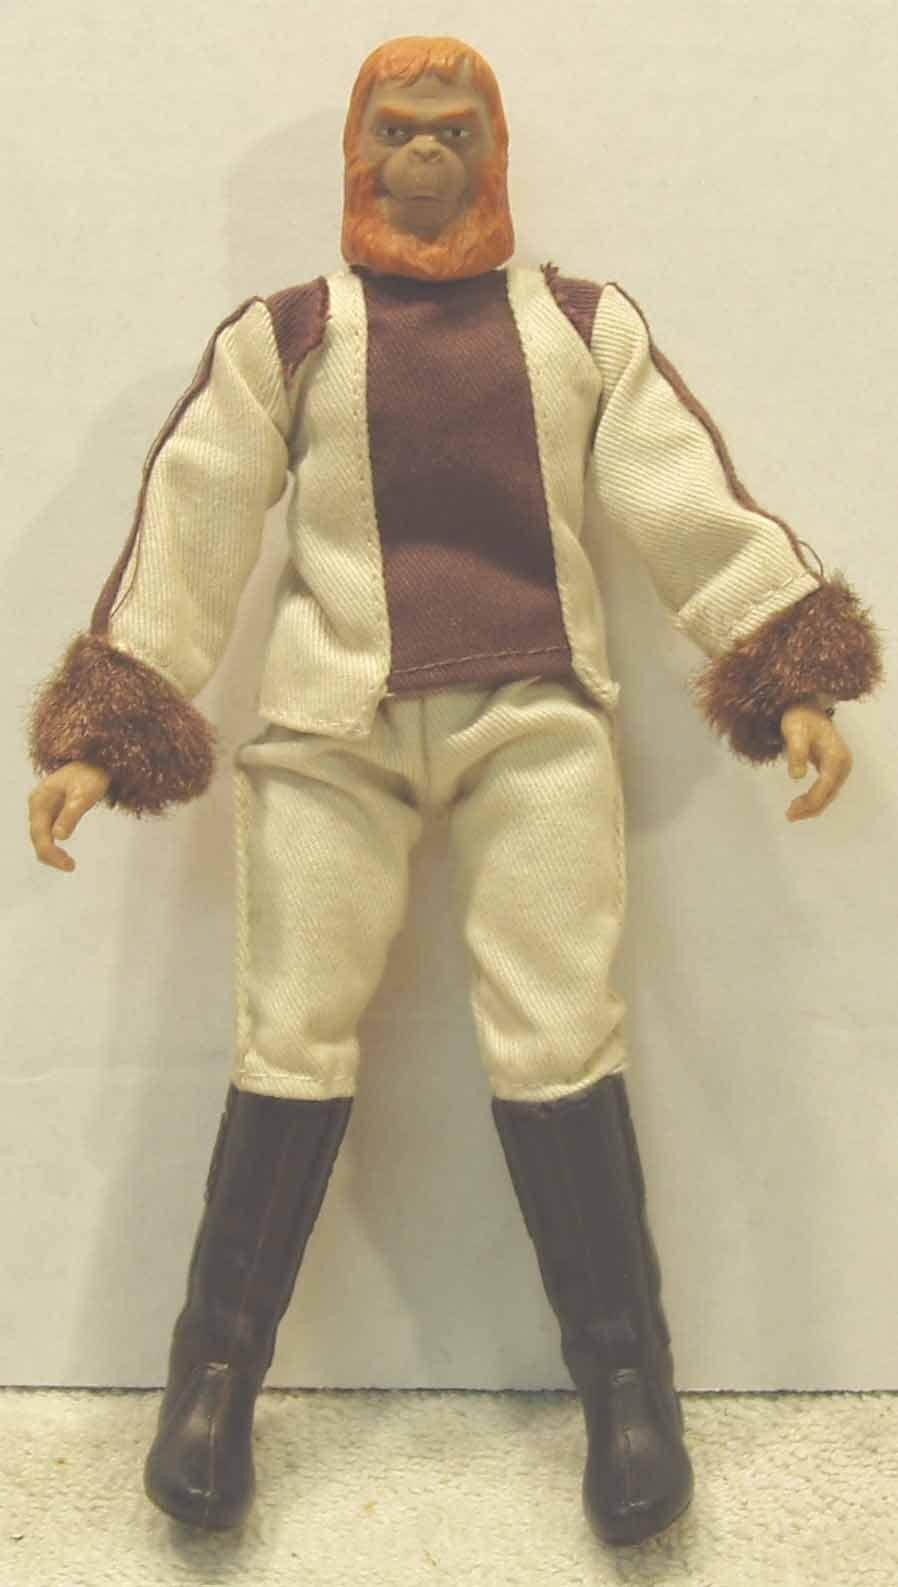 Dr. Zaius from the POTA Movies © 1974 Mego